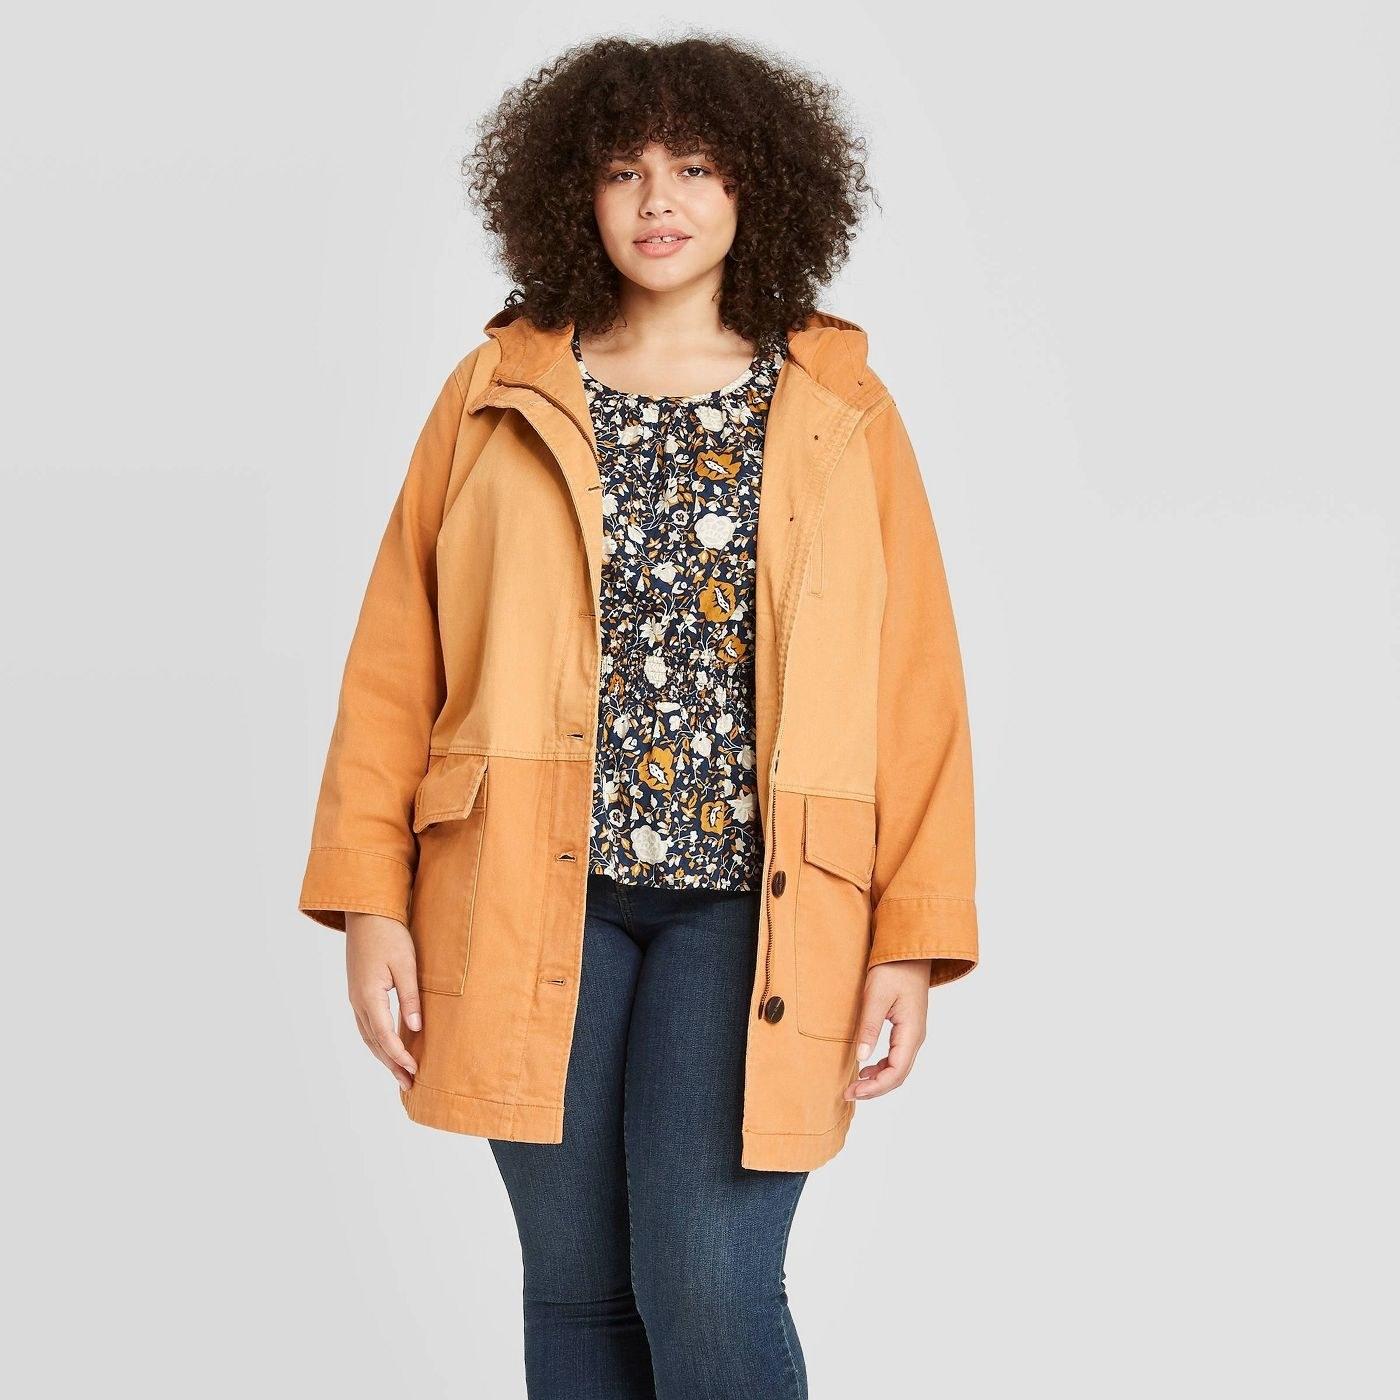 Model wearing orange coat